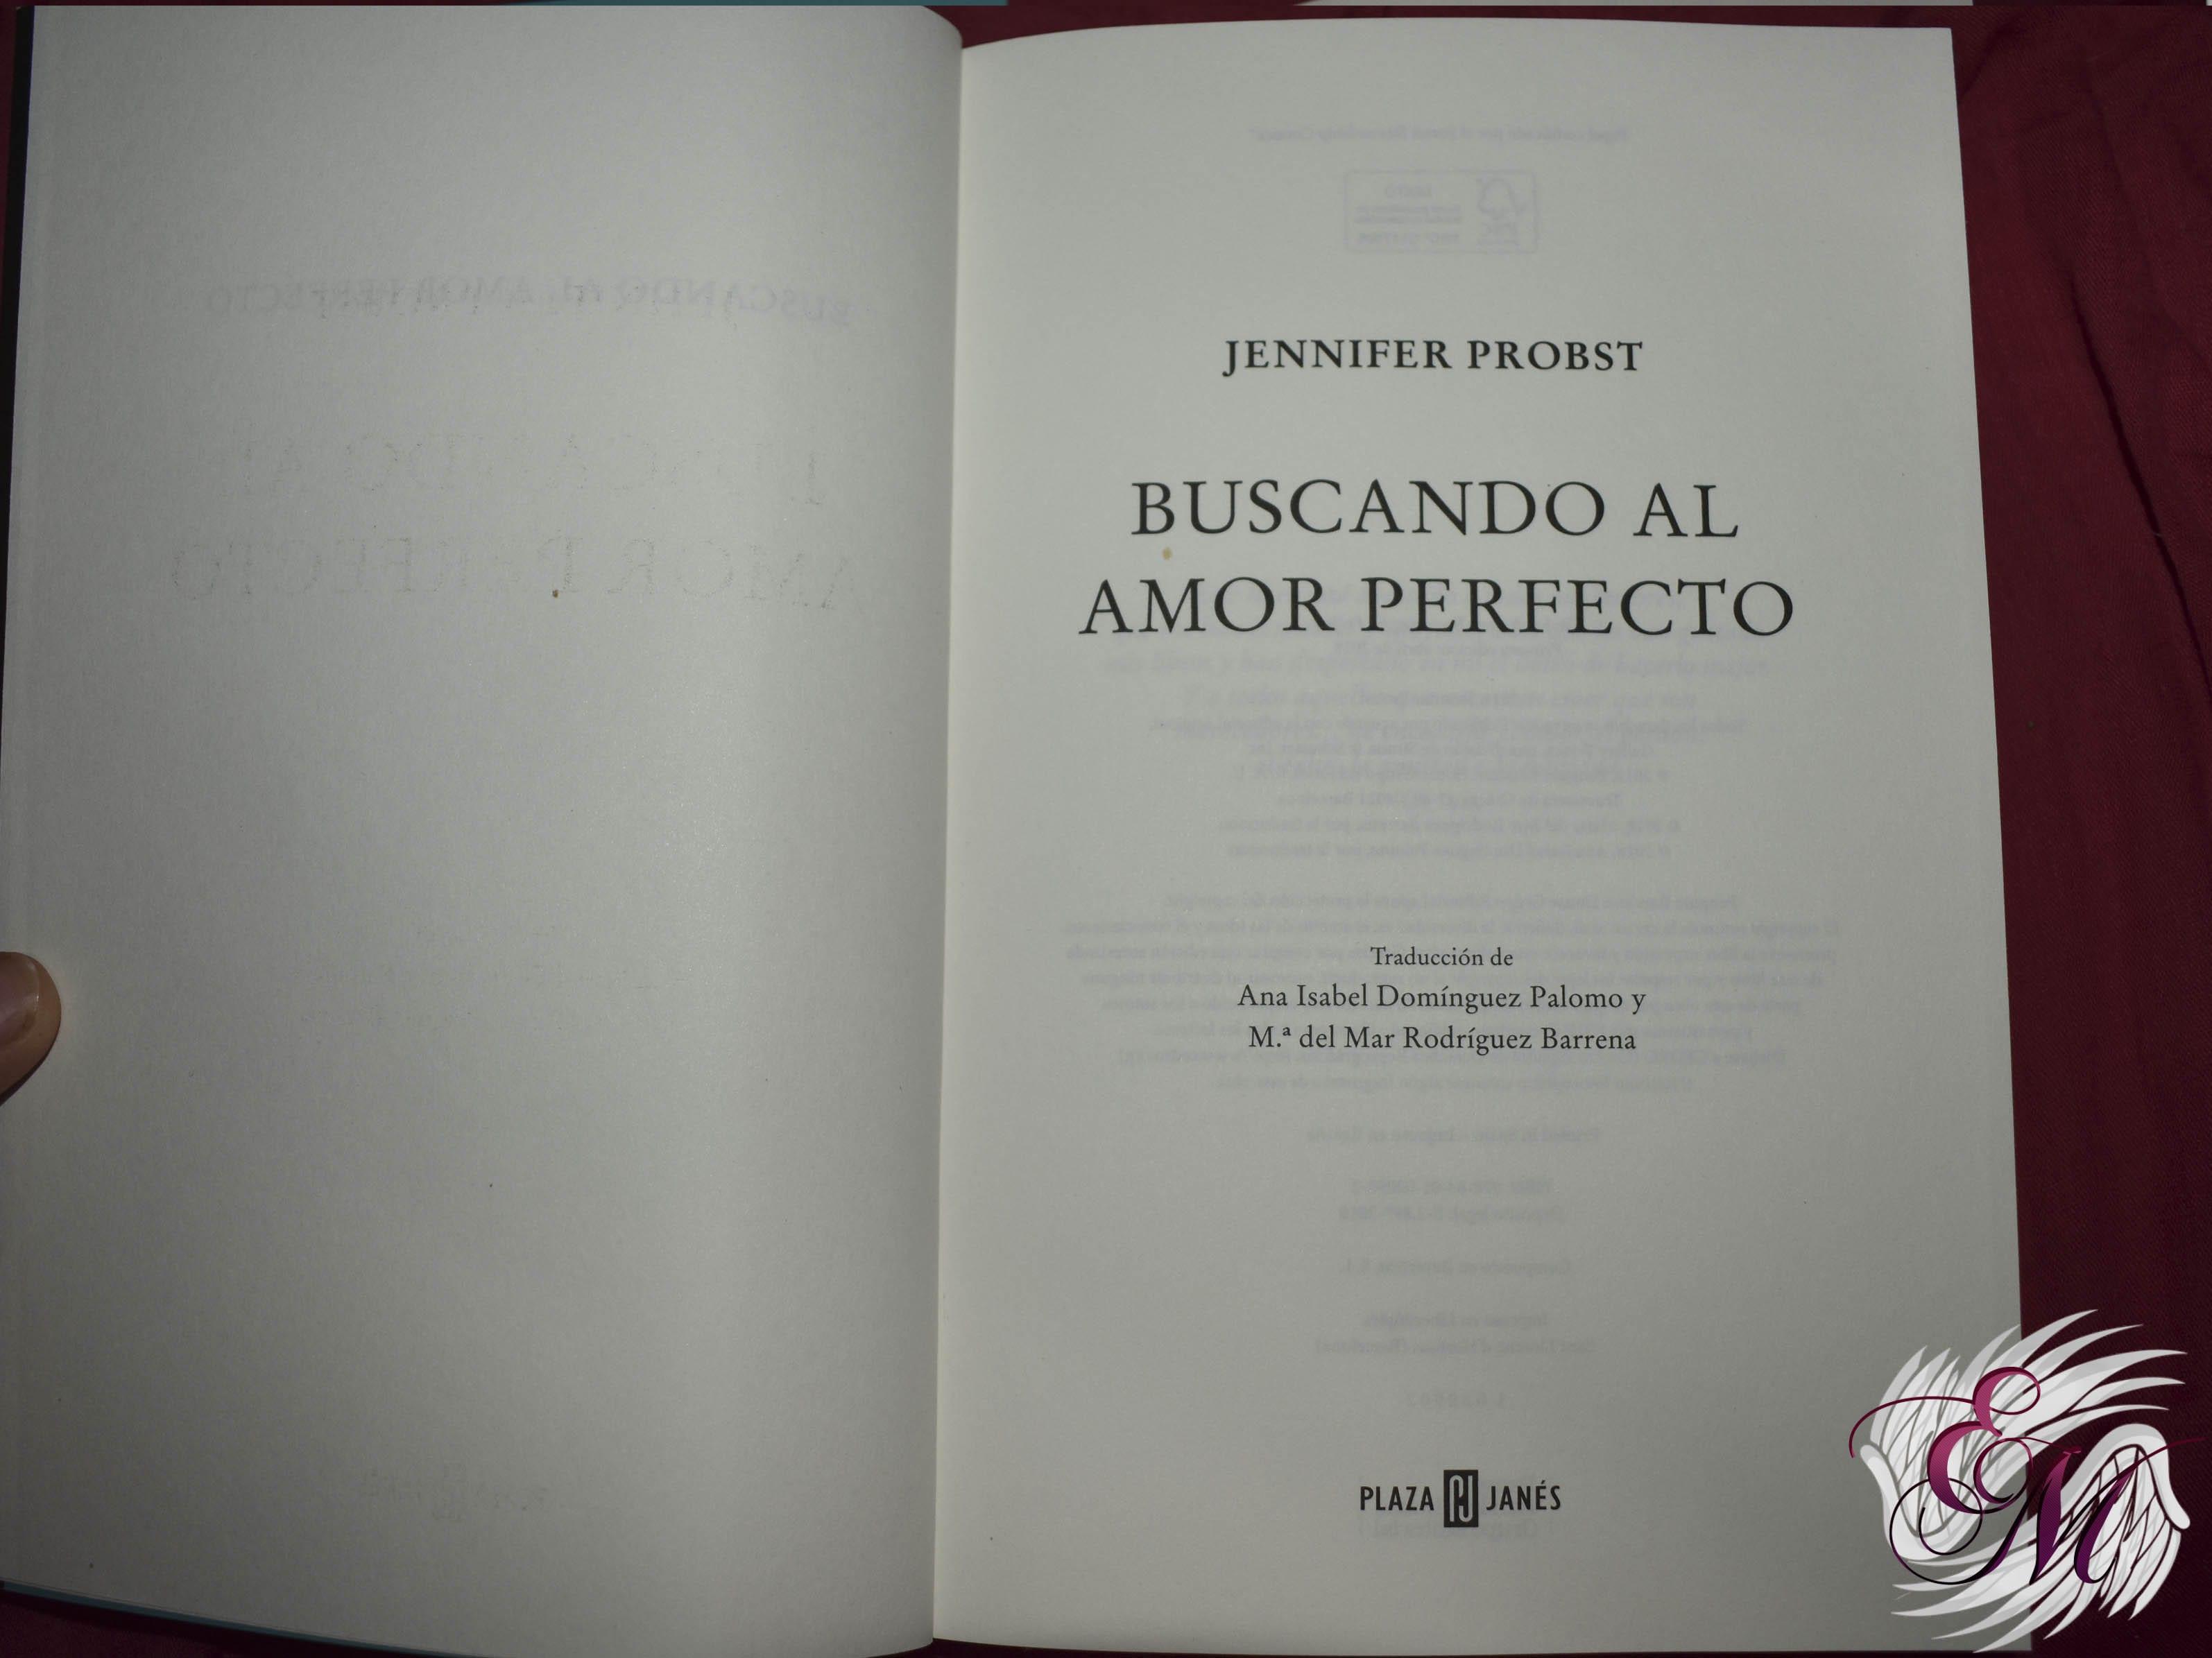 Buscando al amor perfecto, de Jennifer Probst - Reseña